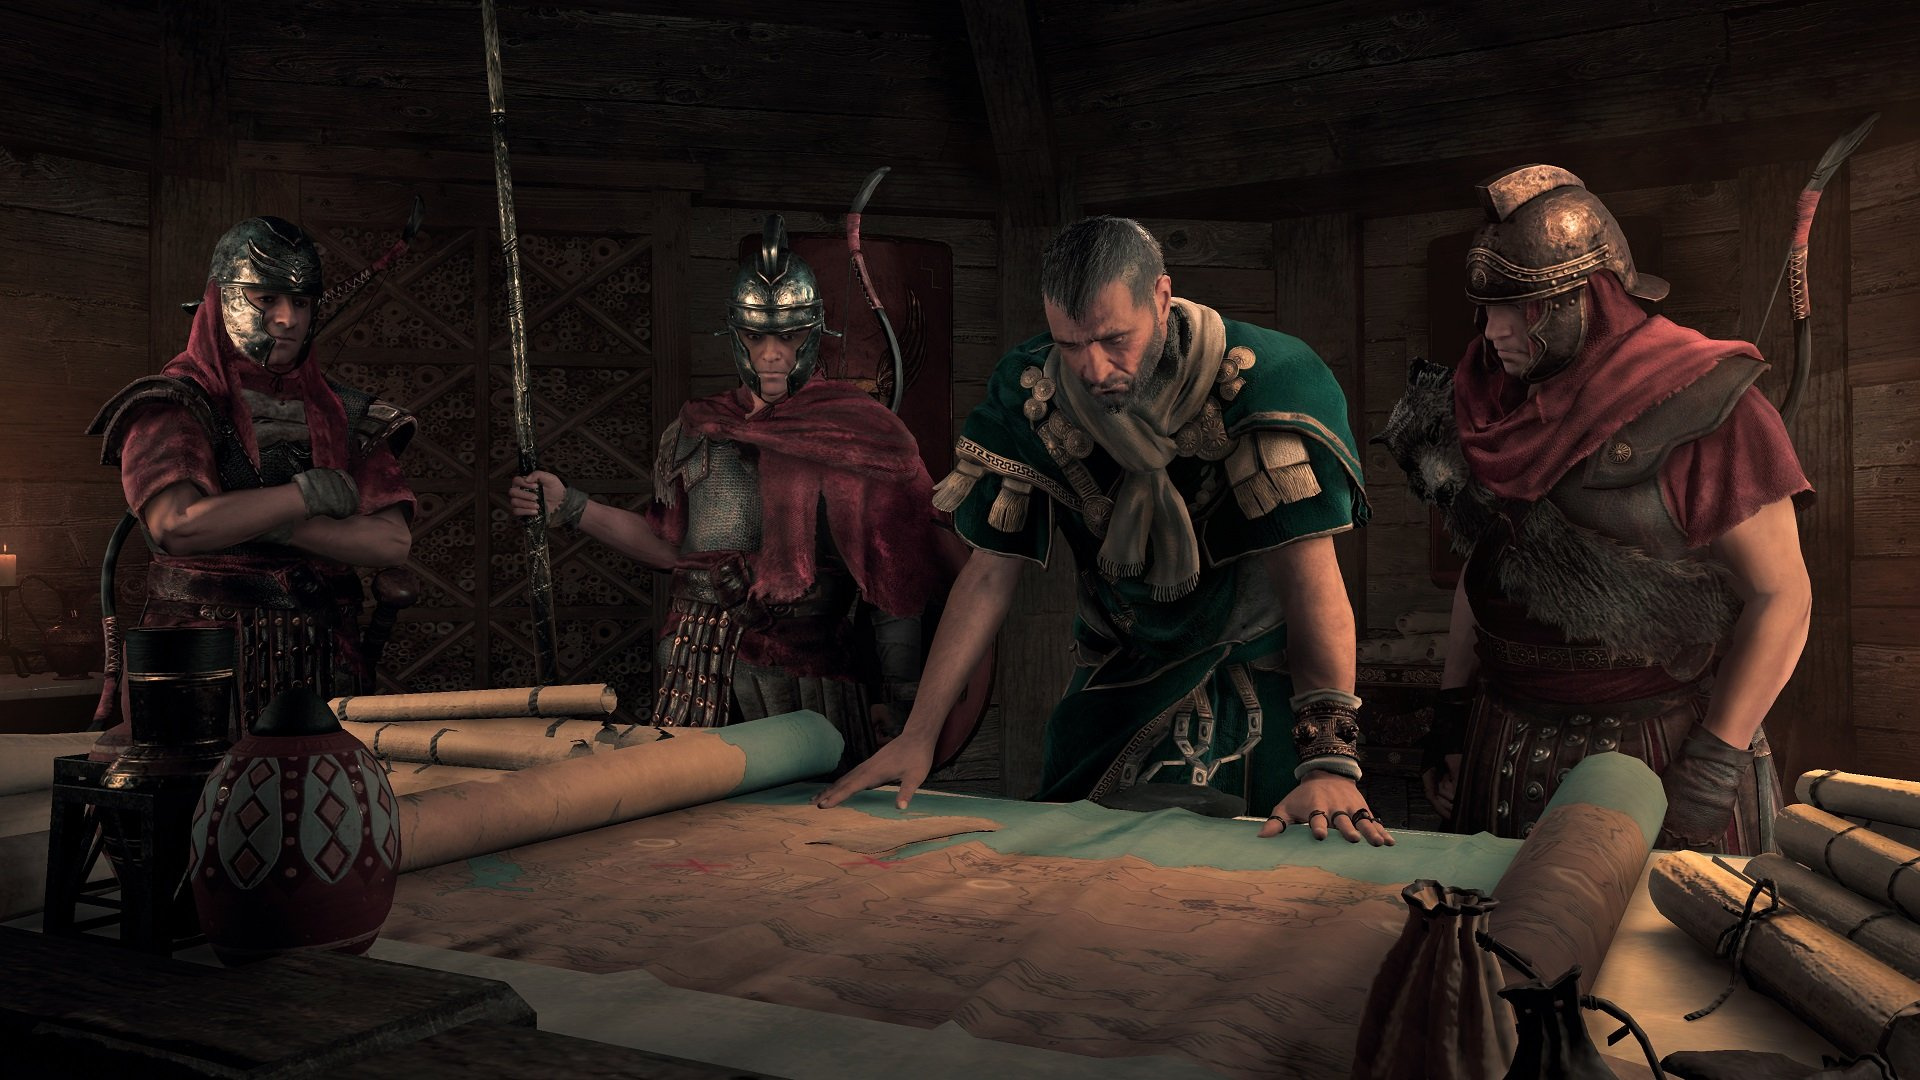 Assassin's Creed Origins: The Hidden Ones review